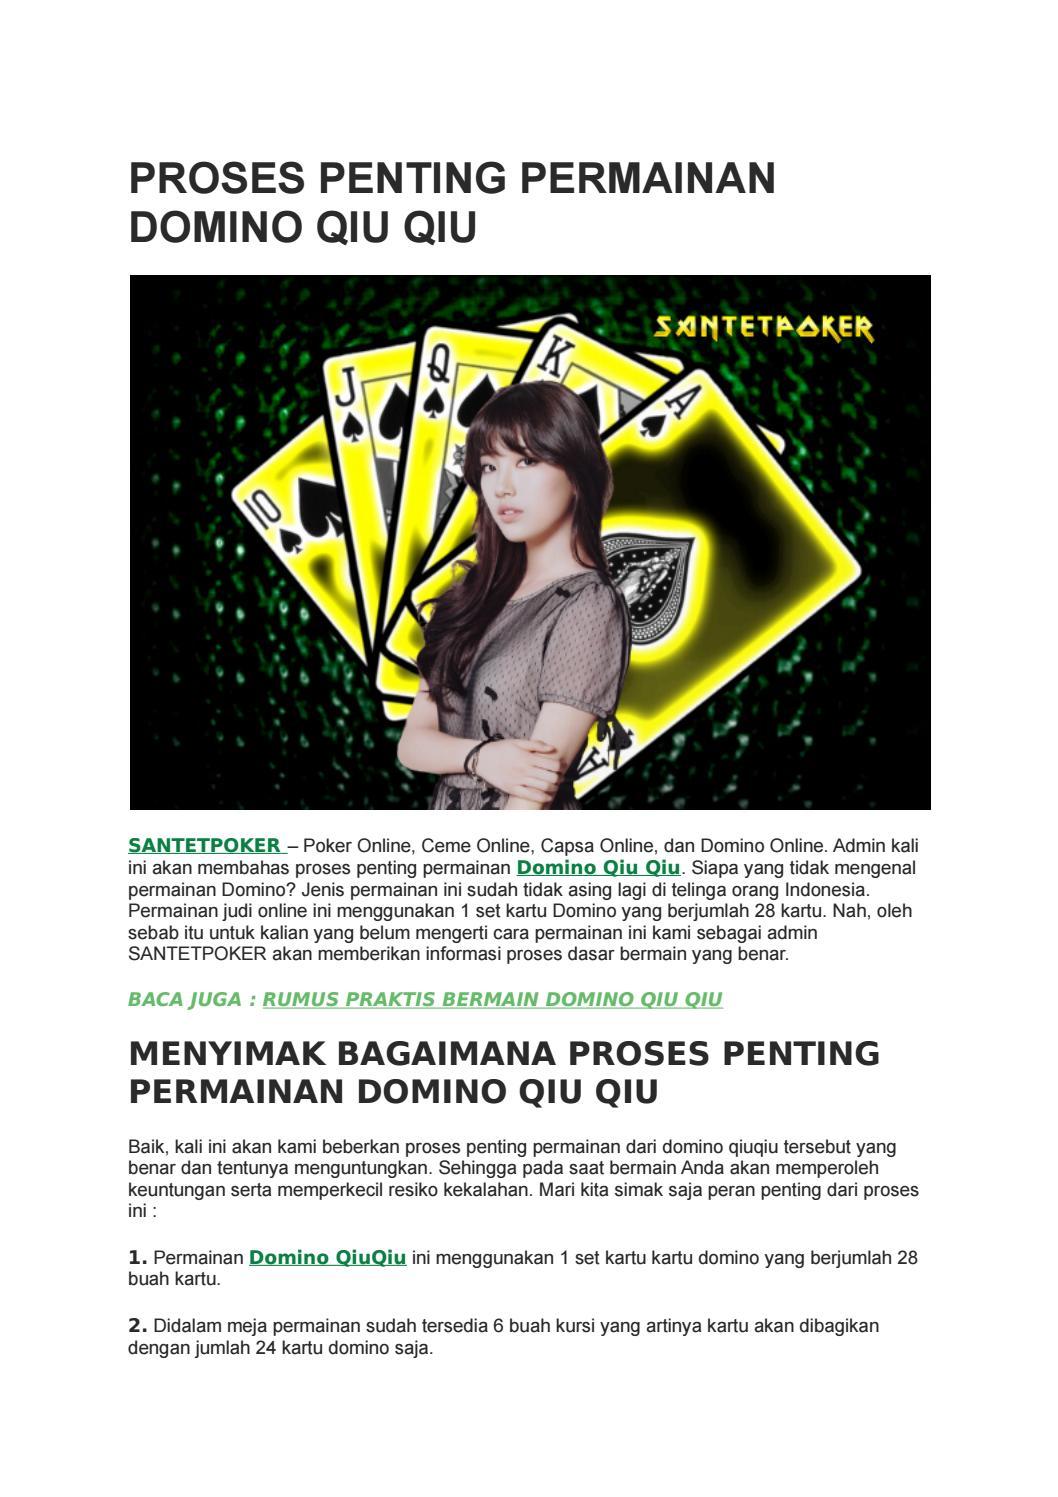 Proses Penting Permainan Domino Qiu Qiu By Santetpoker Poker Online Ceme Online Capsa Online Domino Online Issuu